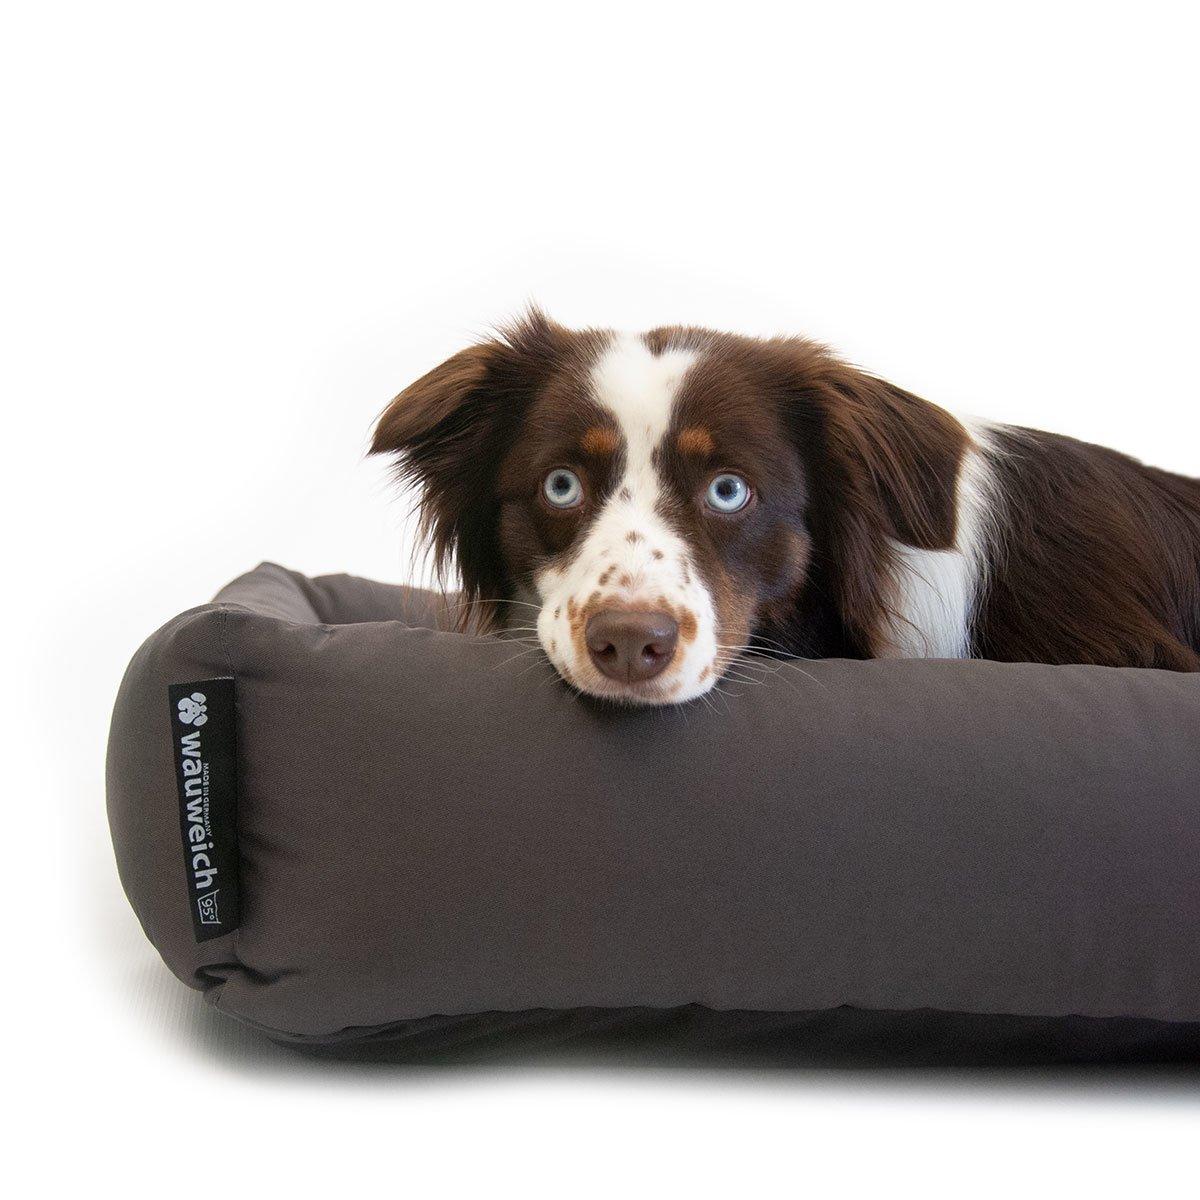 95 Grad Hundebett mit Einlegekissen Bild 4